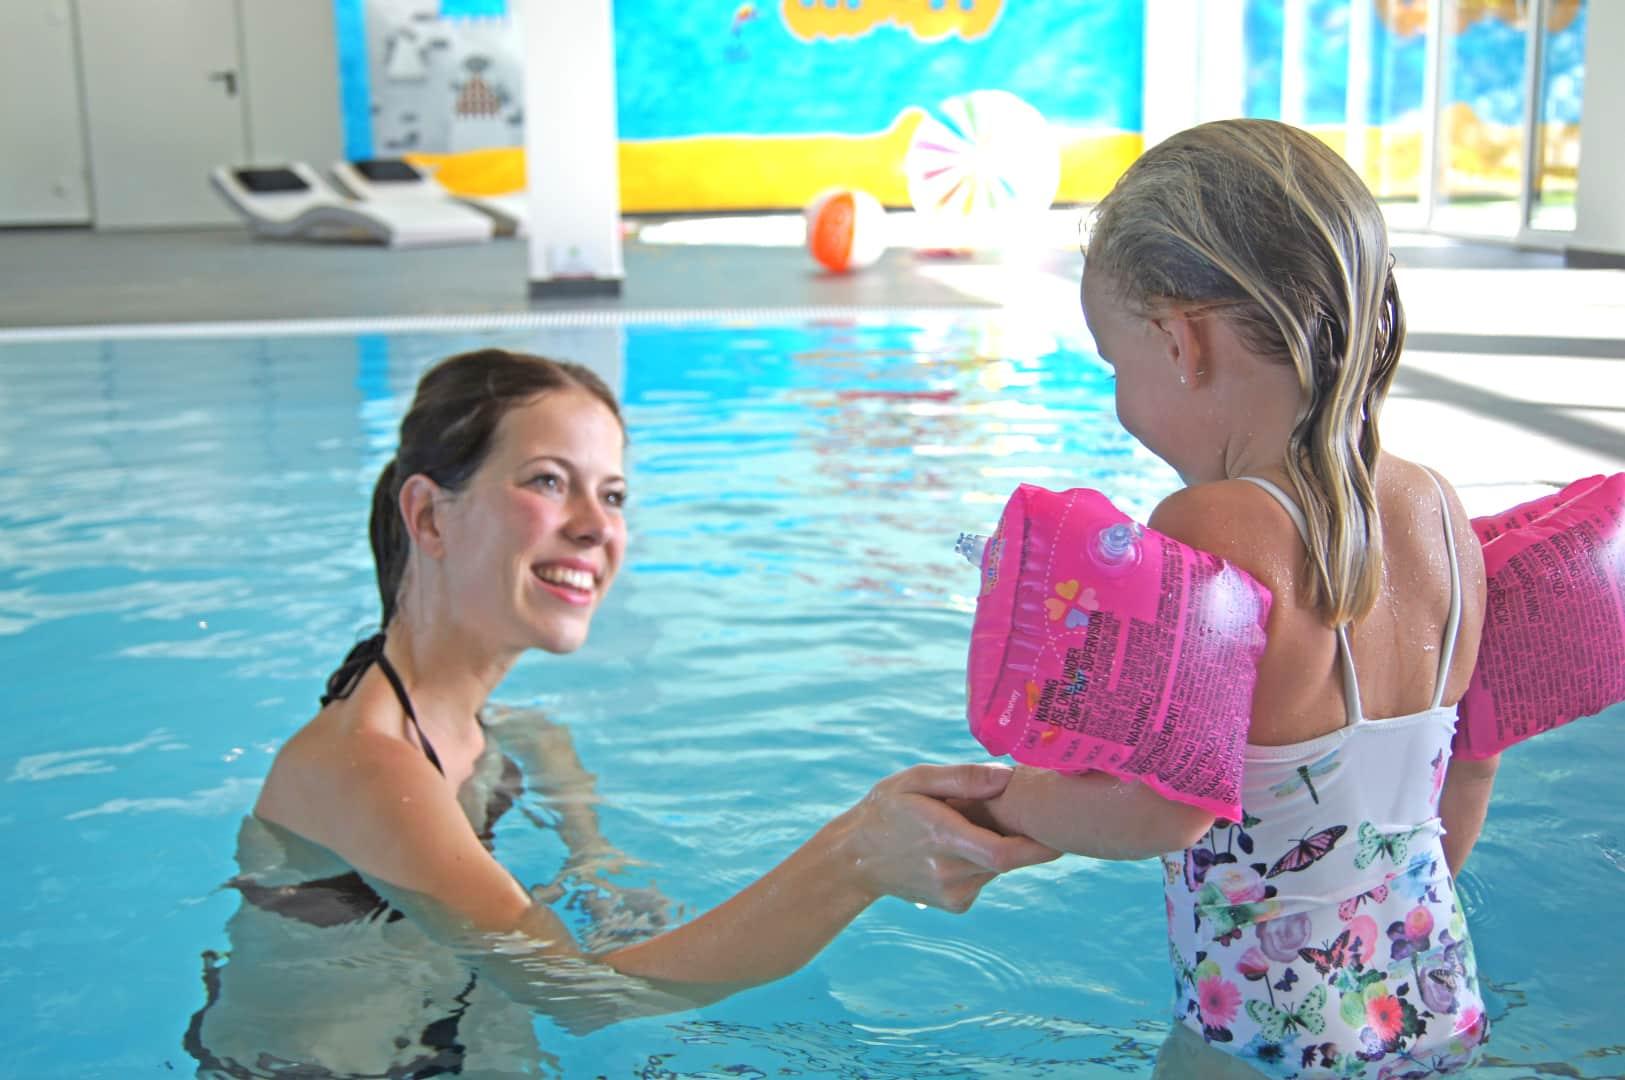 Familotel Gut Landegge Emsland Familienurlaub Schwimmbad